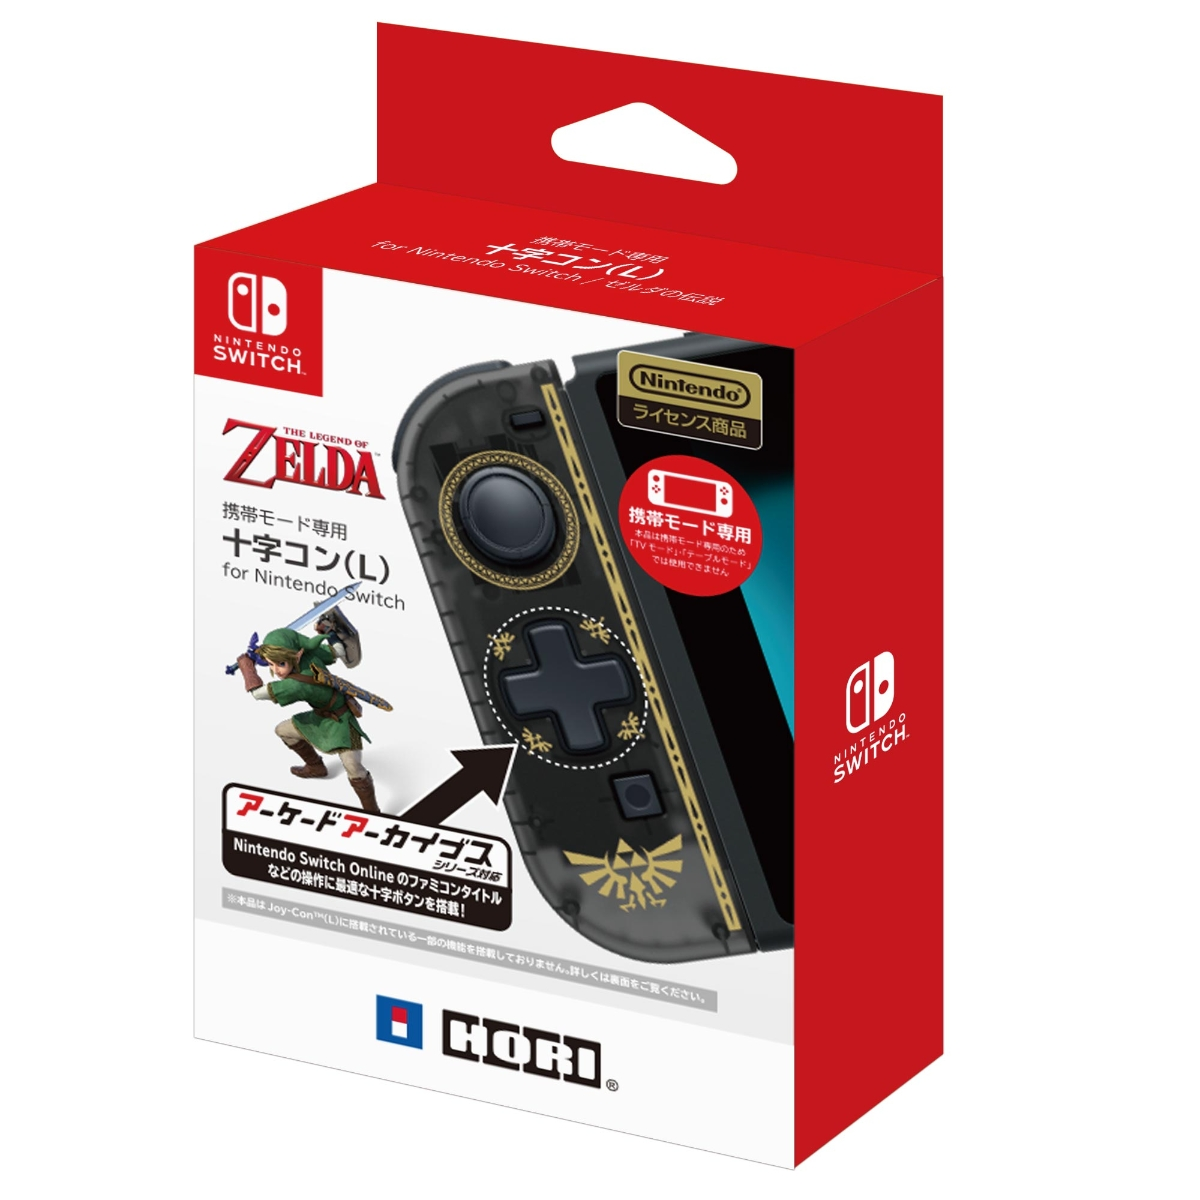 Nintendo Switch 3DS PSVita 携帯モード専用 十字コン(L) 【ゼルダの伝説】